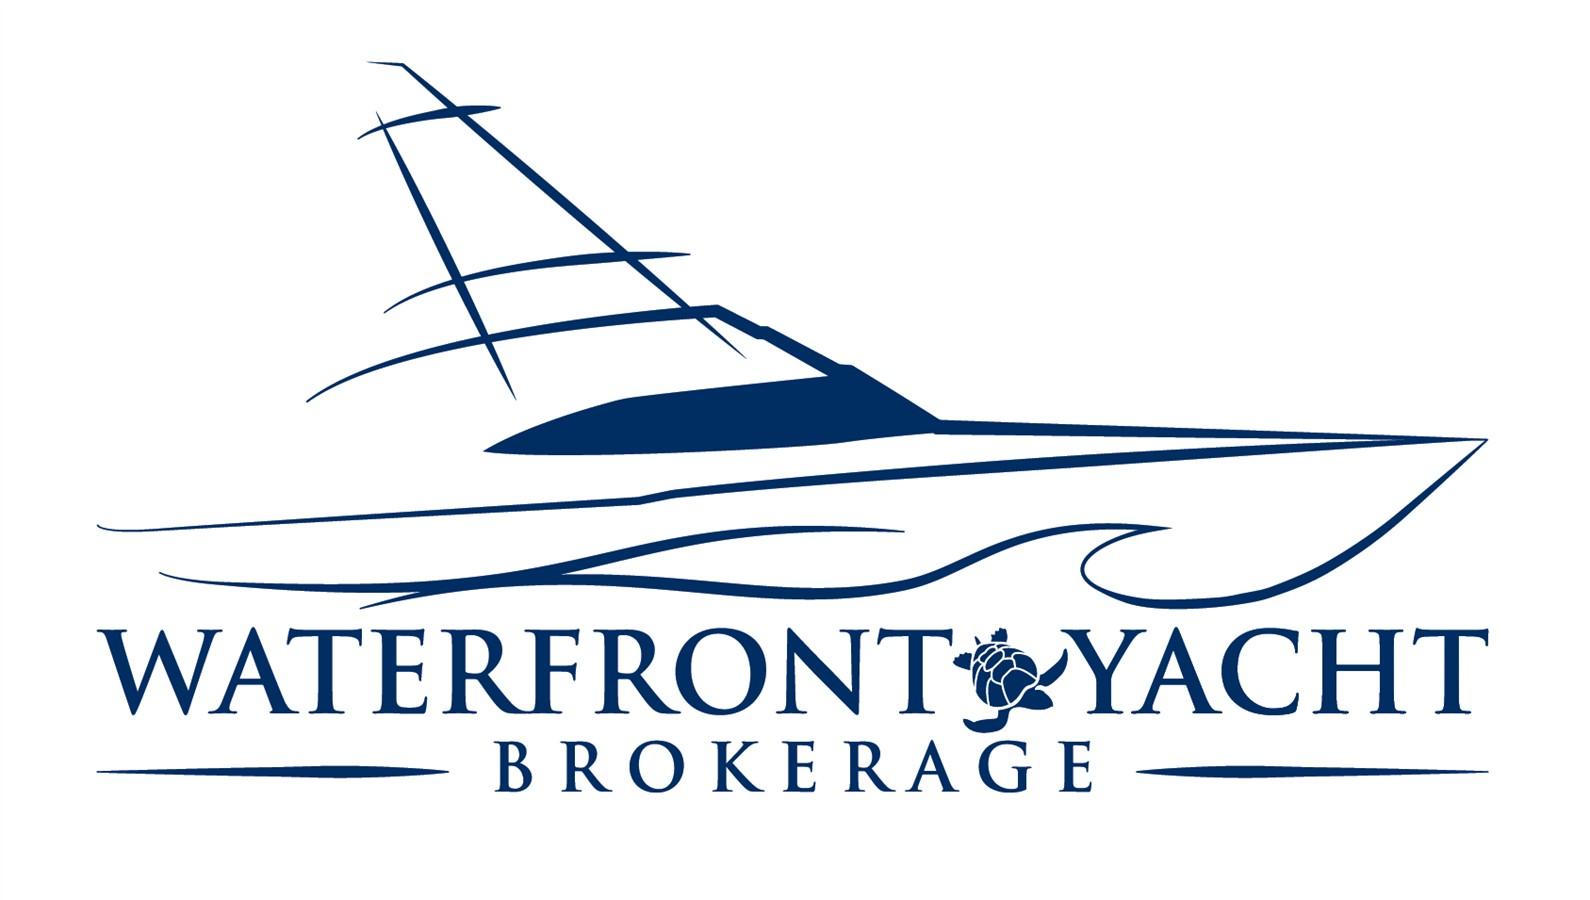 Waterfront Yacht Brokerage